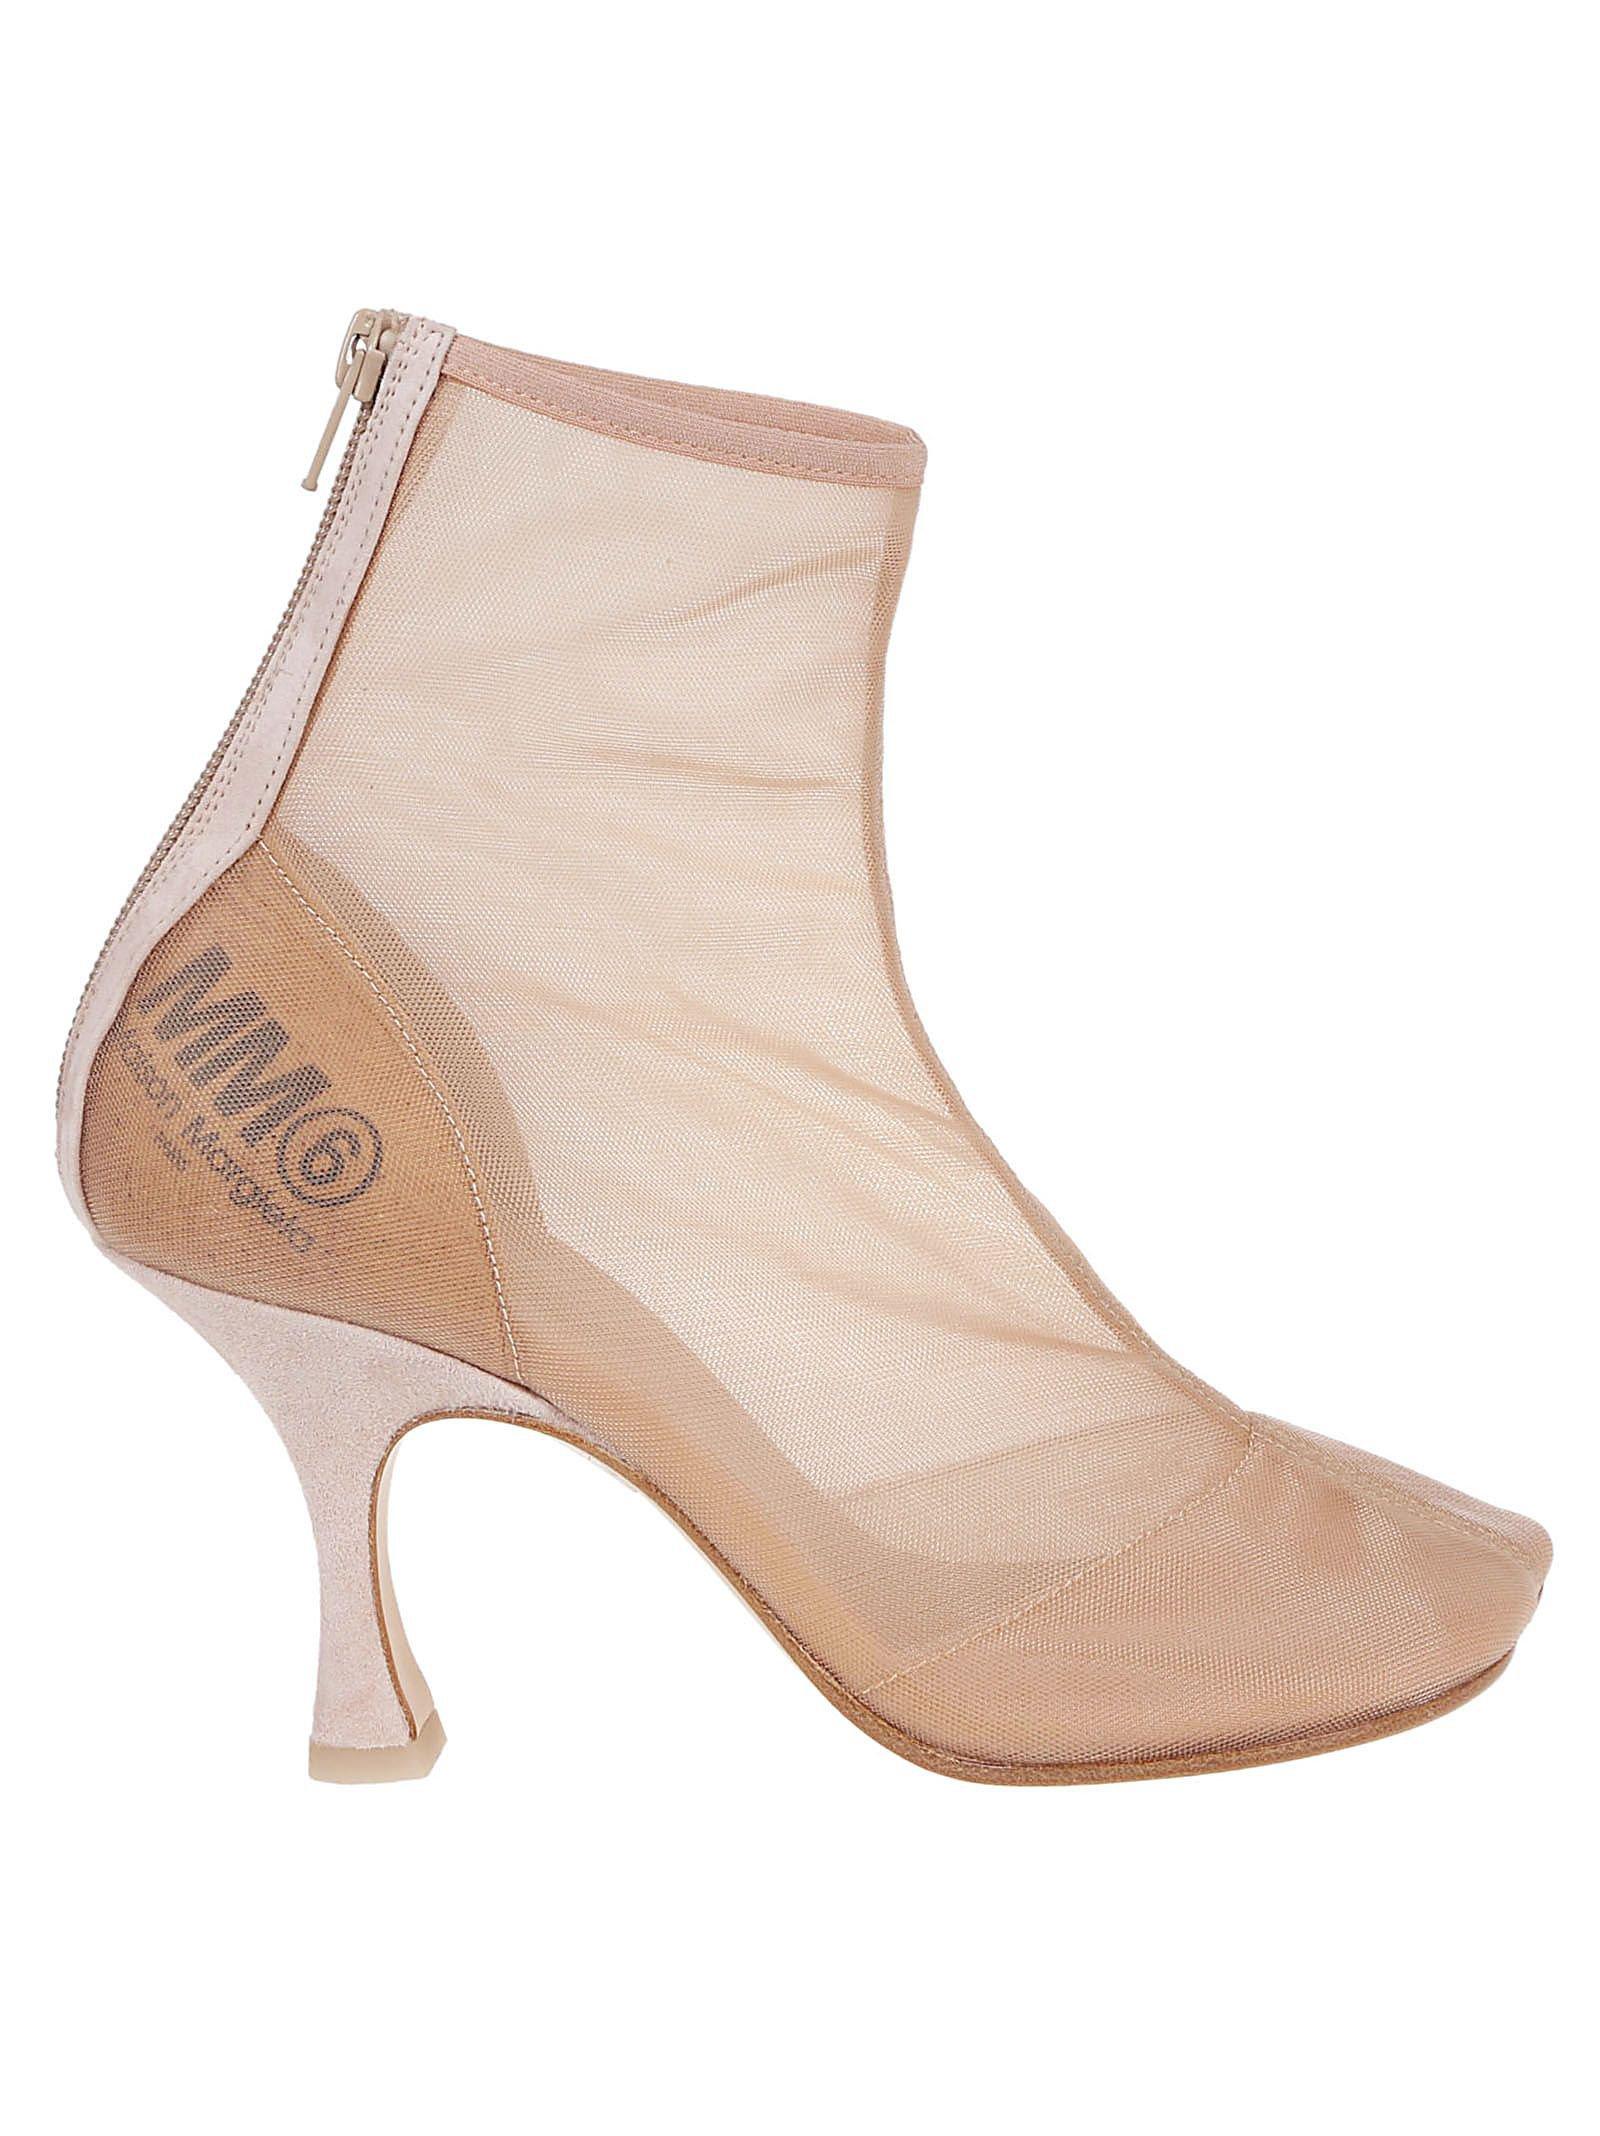 Mm6 Maison Margiela Zipped Ankle Boots